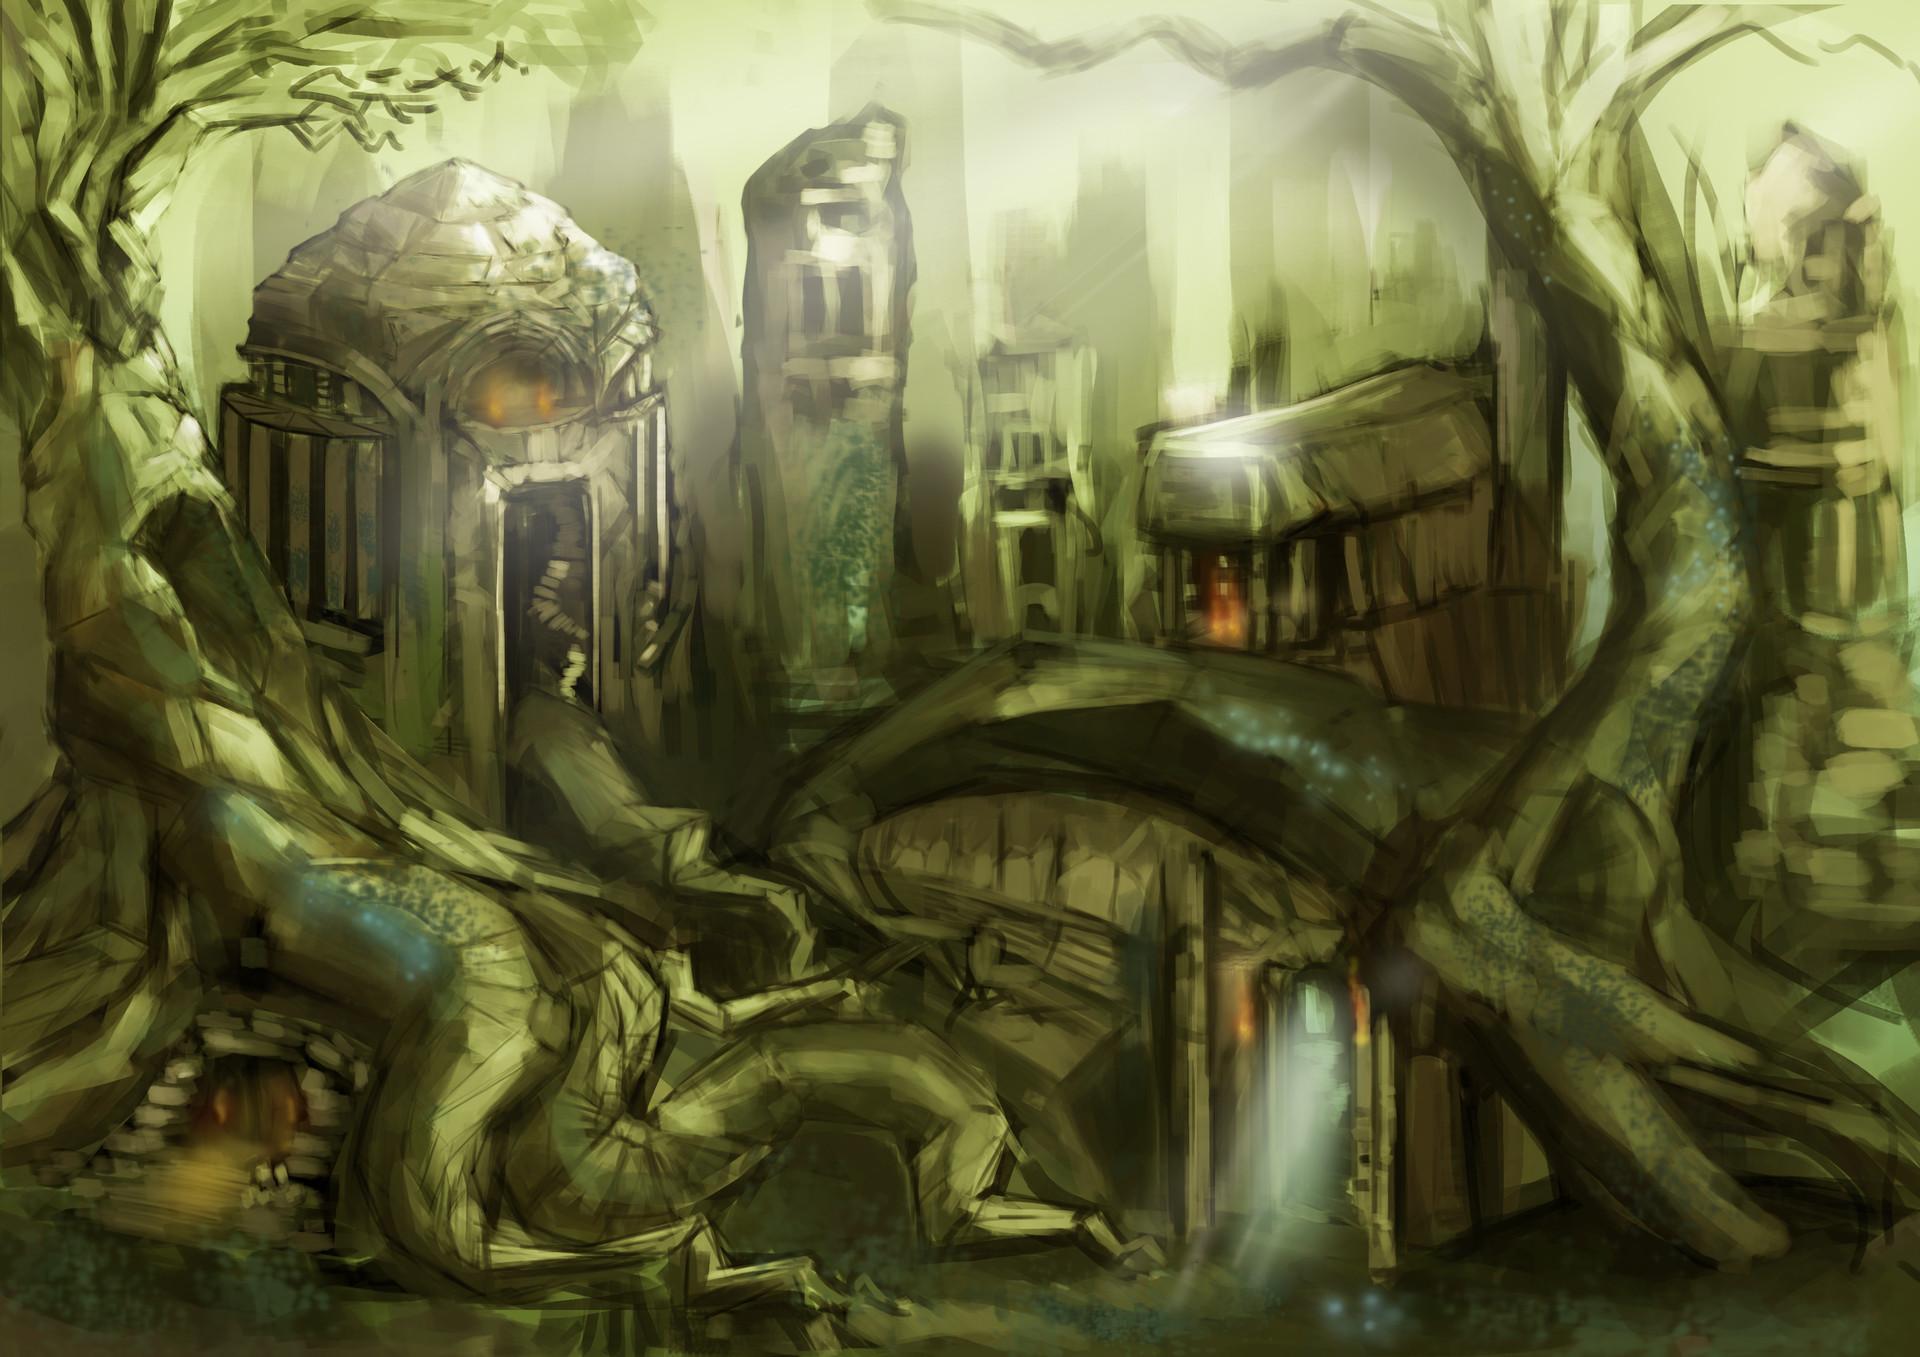 ArtStation - A Jump and Run game, Unity 2D/3D Project, Richard Kessler